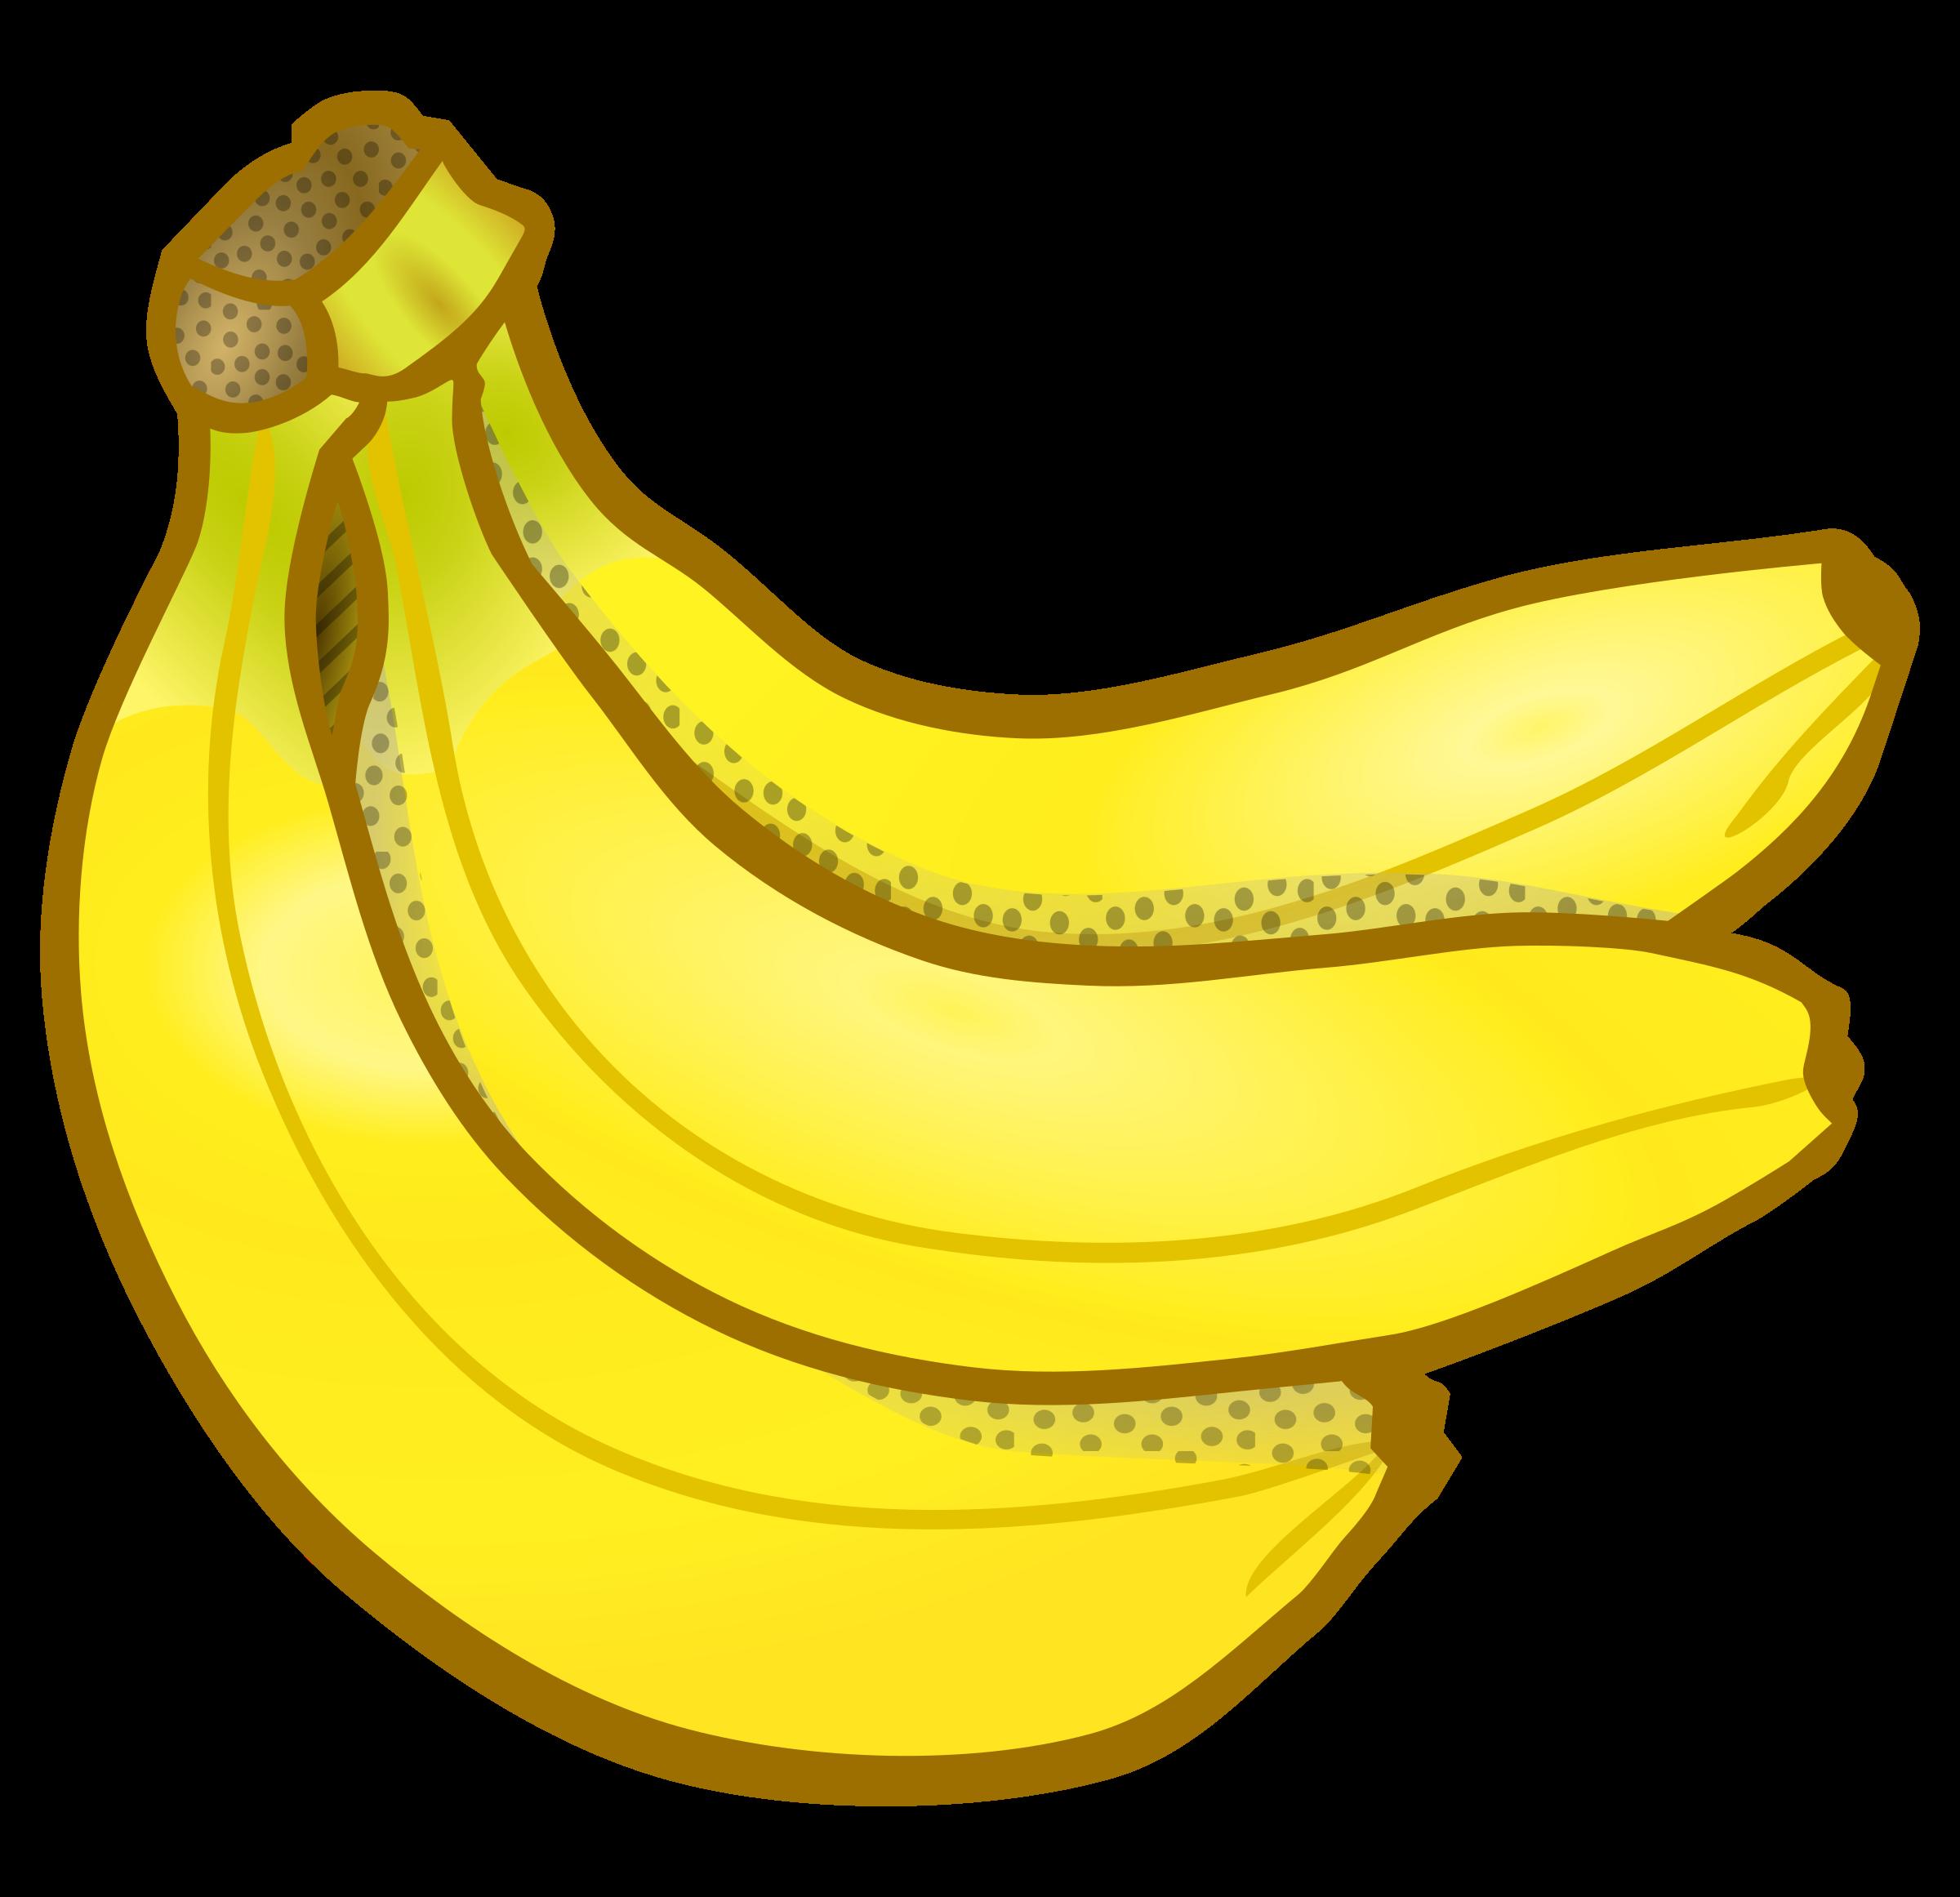 Banana clipart banana bunch Coloured coloured bananas of bananas